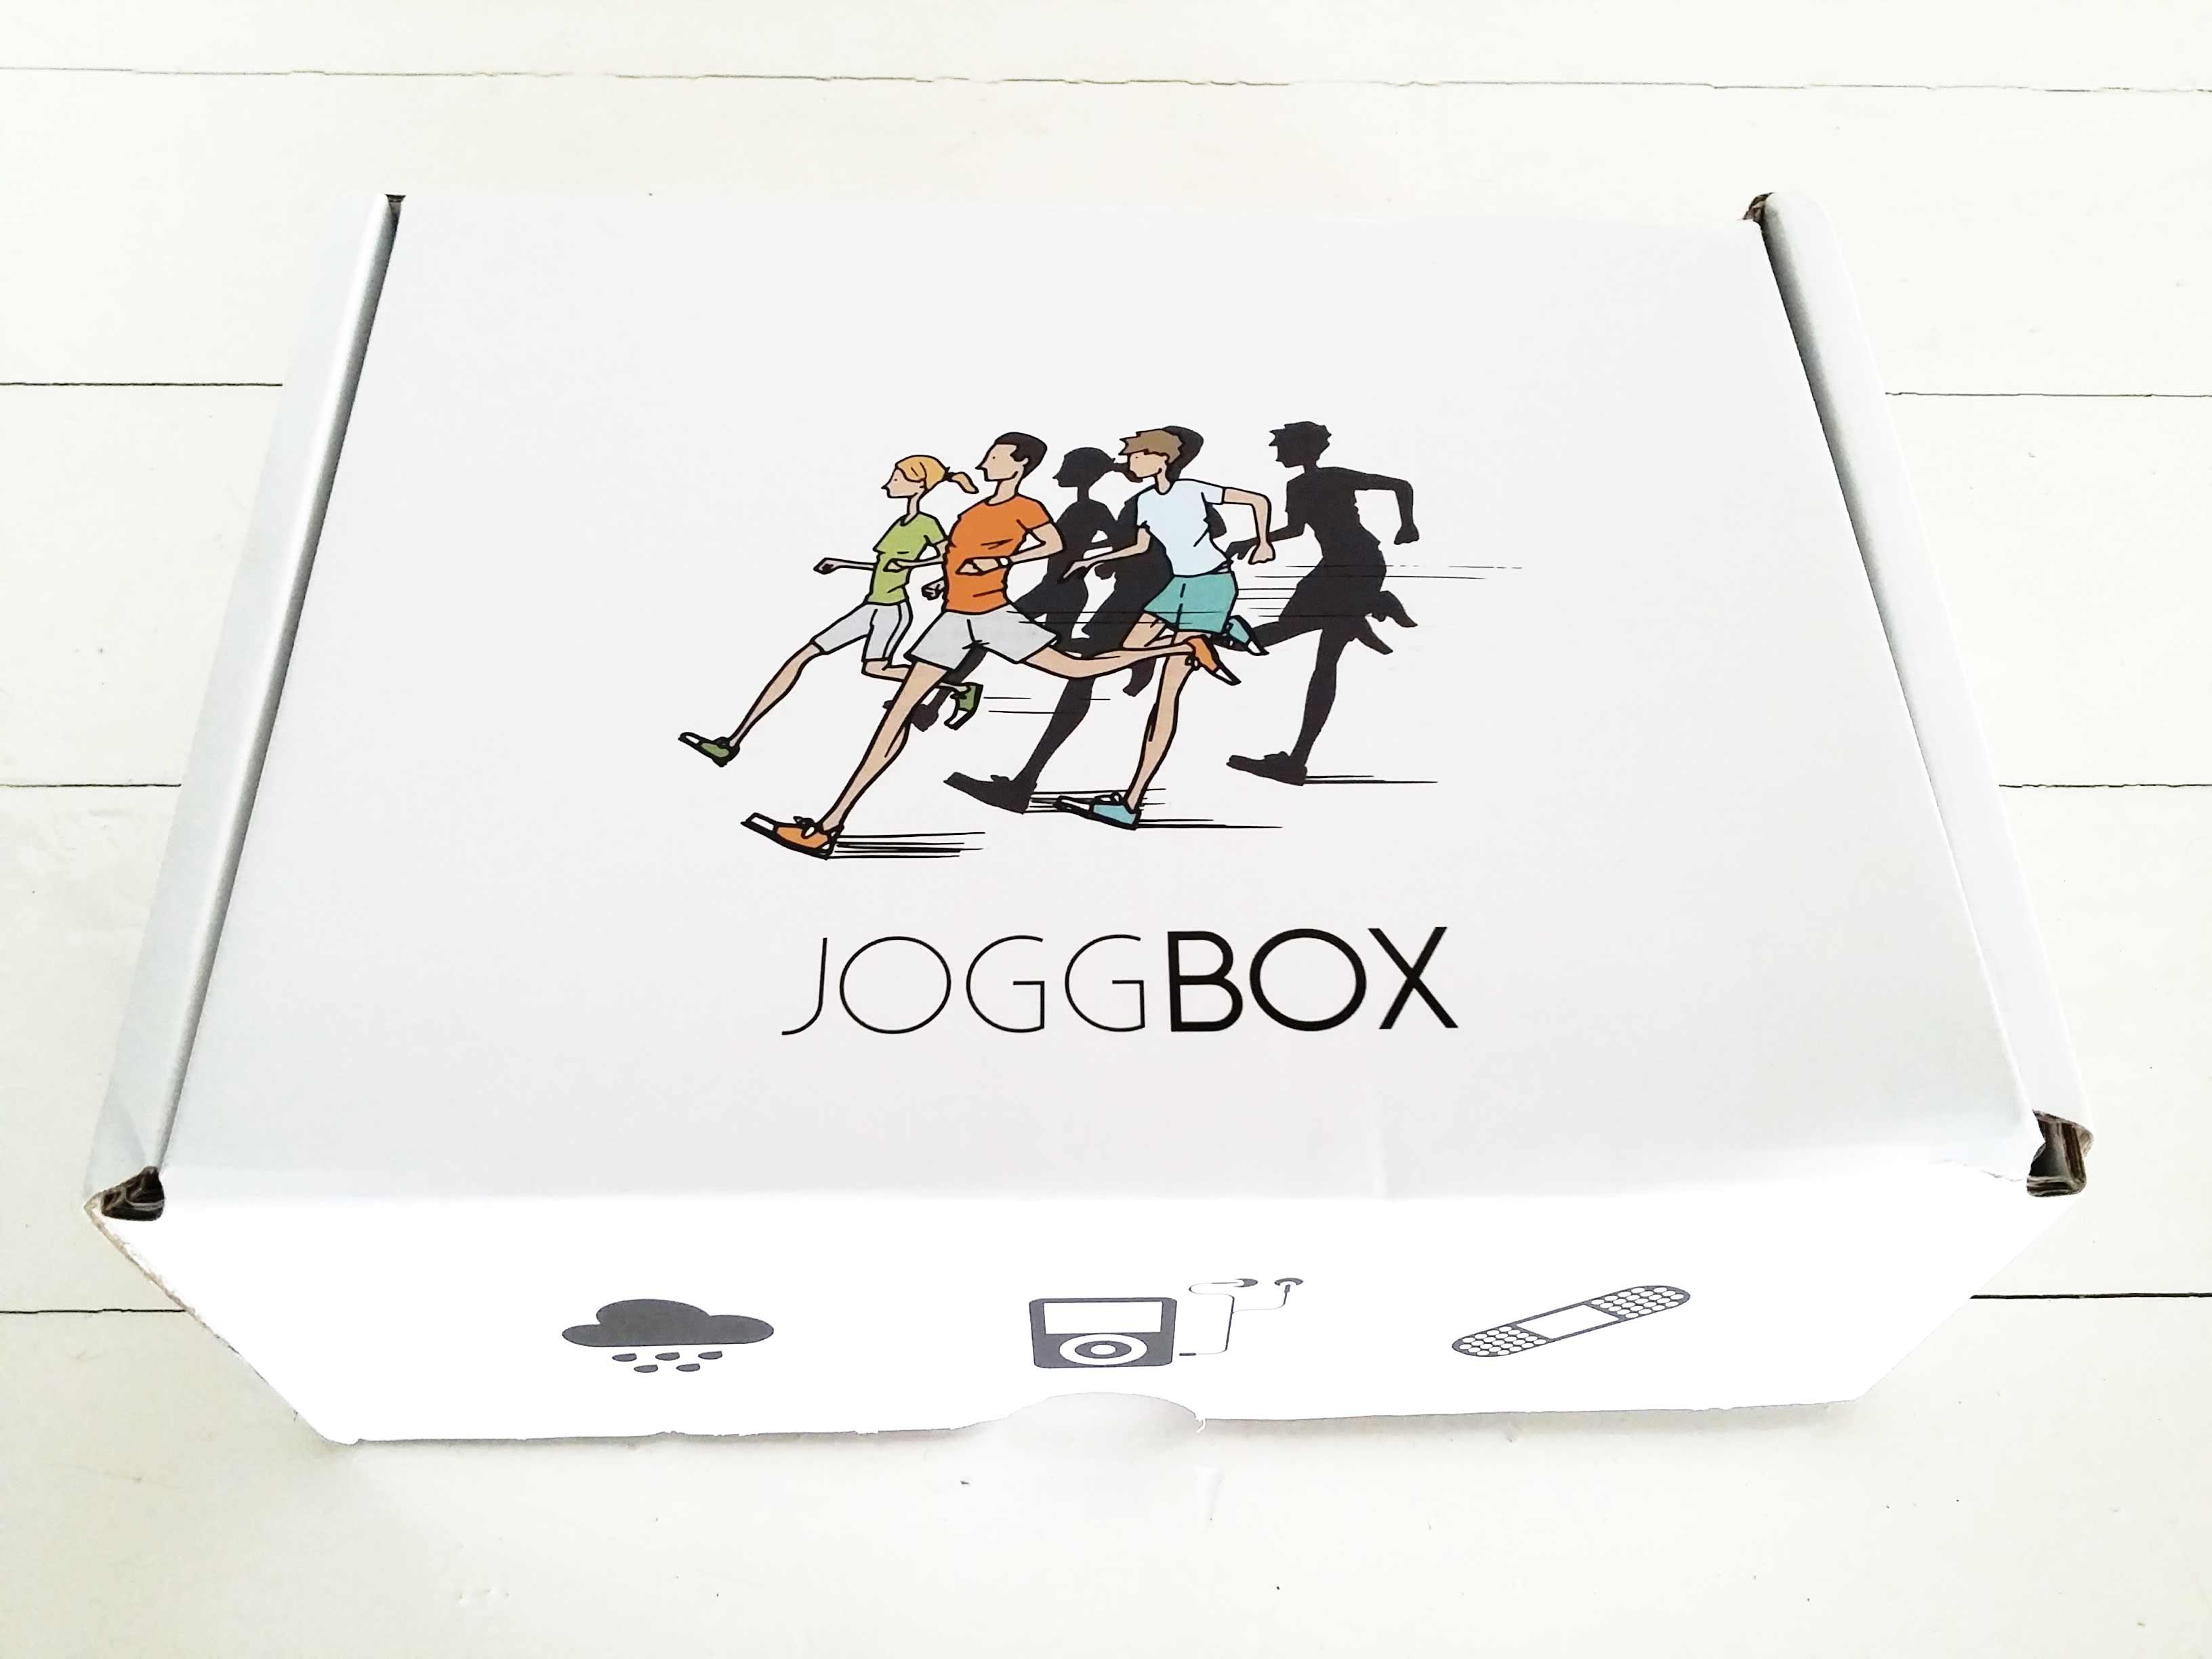 Joggbox-1